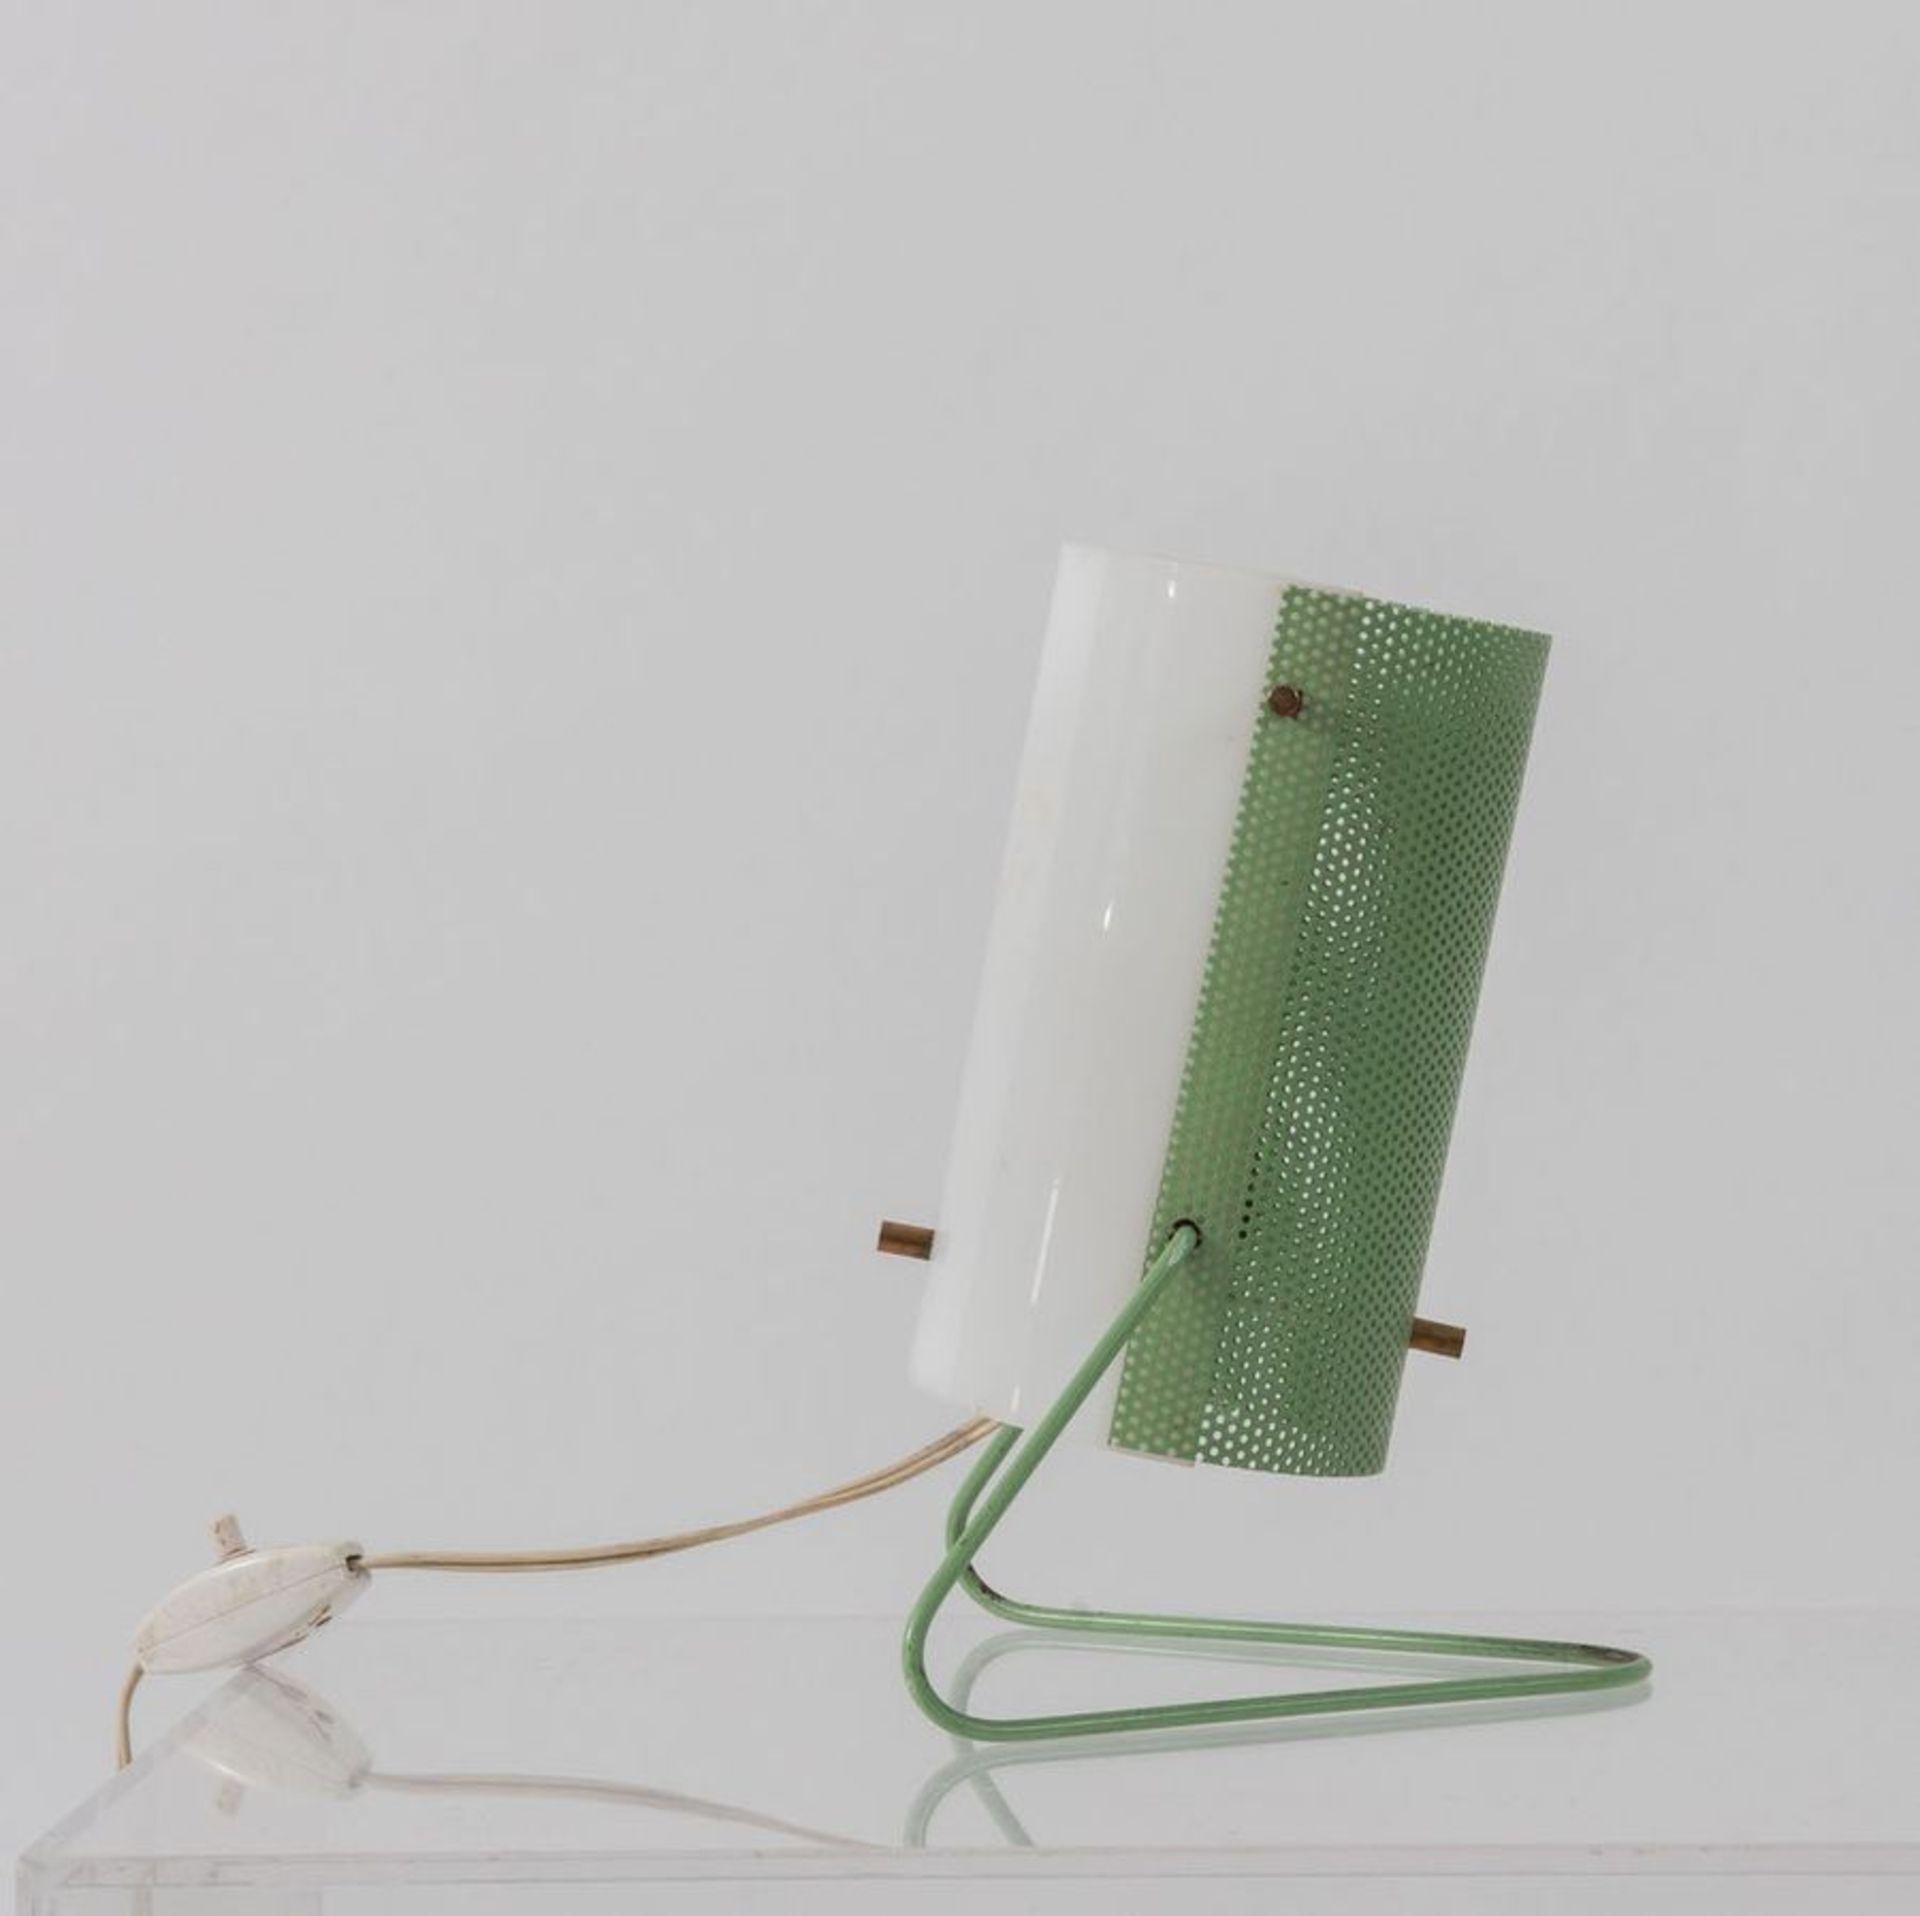 STILUX Lampada da tavolo in metallo perforato e perspex. Prod. Stilux, Italia, 1960 ca. Cm 22x17x15. - Bild 3 aus 3